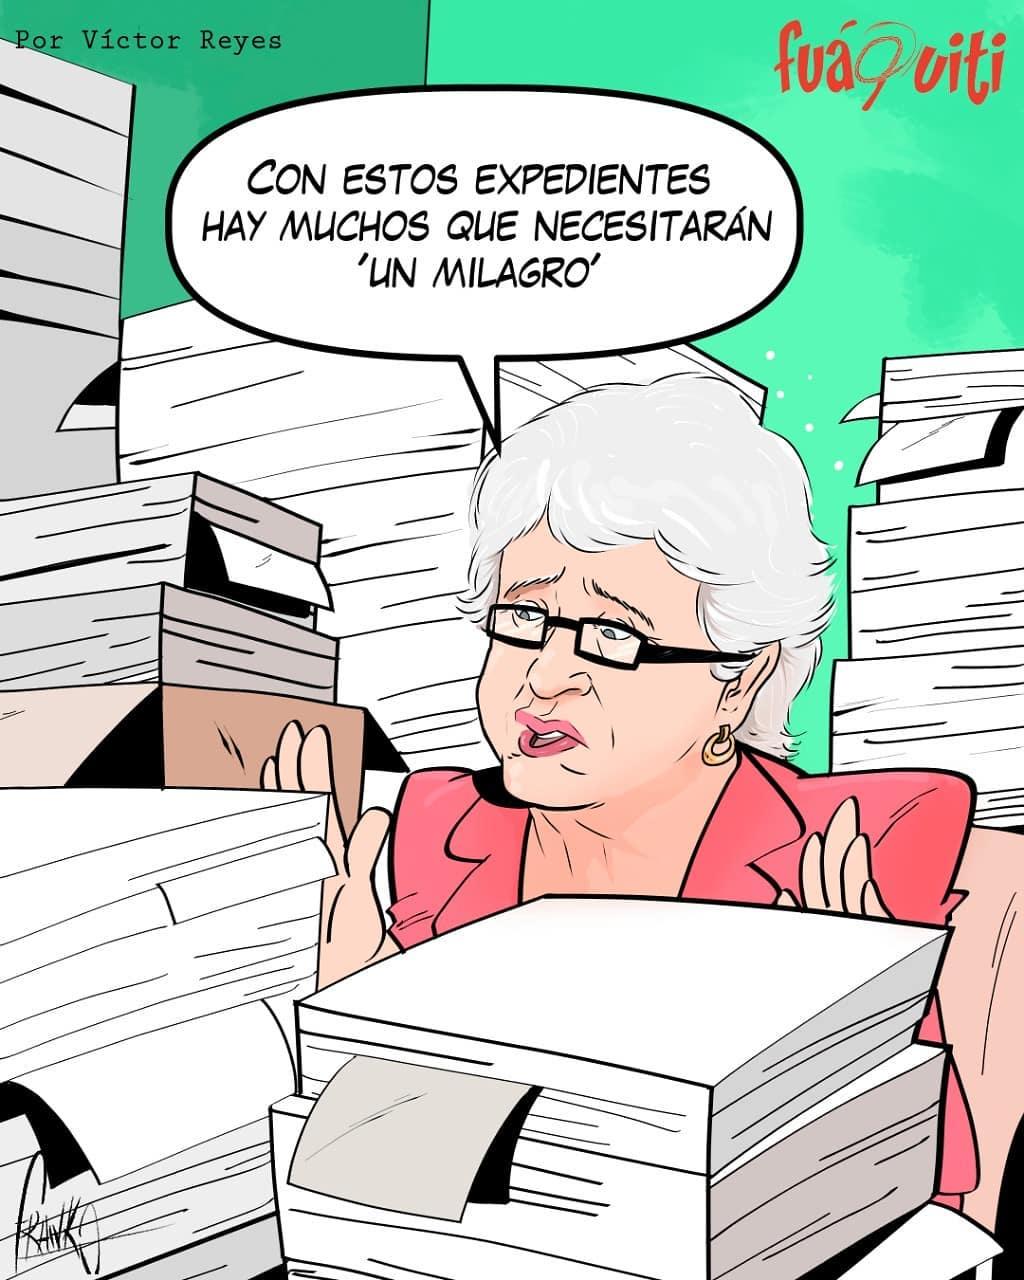 Caricatura Fuaquiti, 24 de Octubre, 2020 – ¡Ni un milagro nos salva!